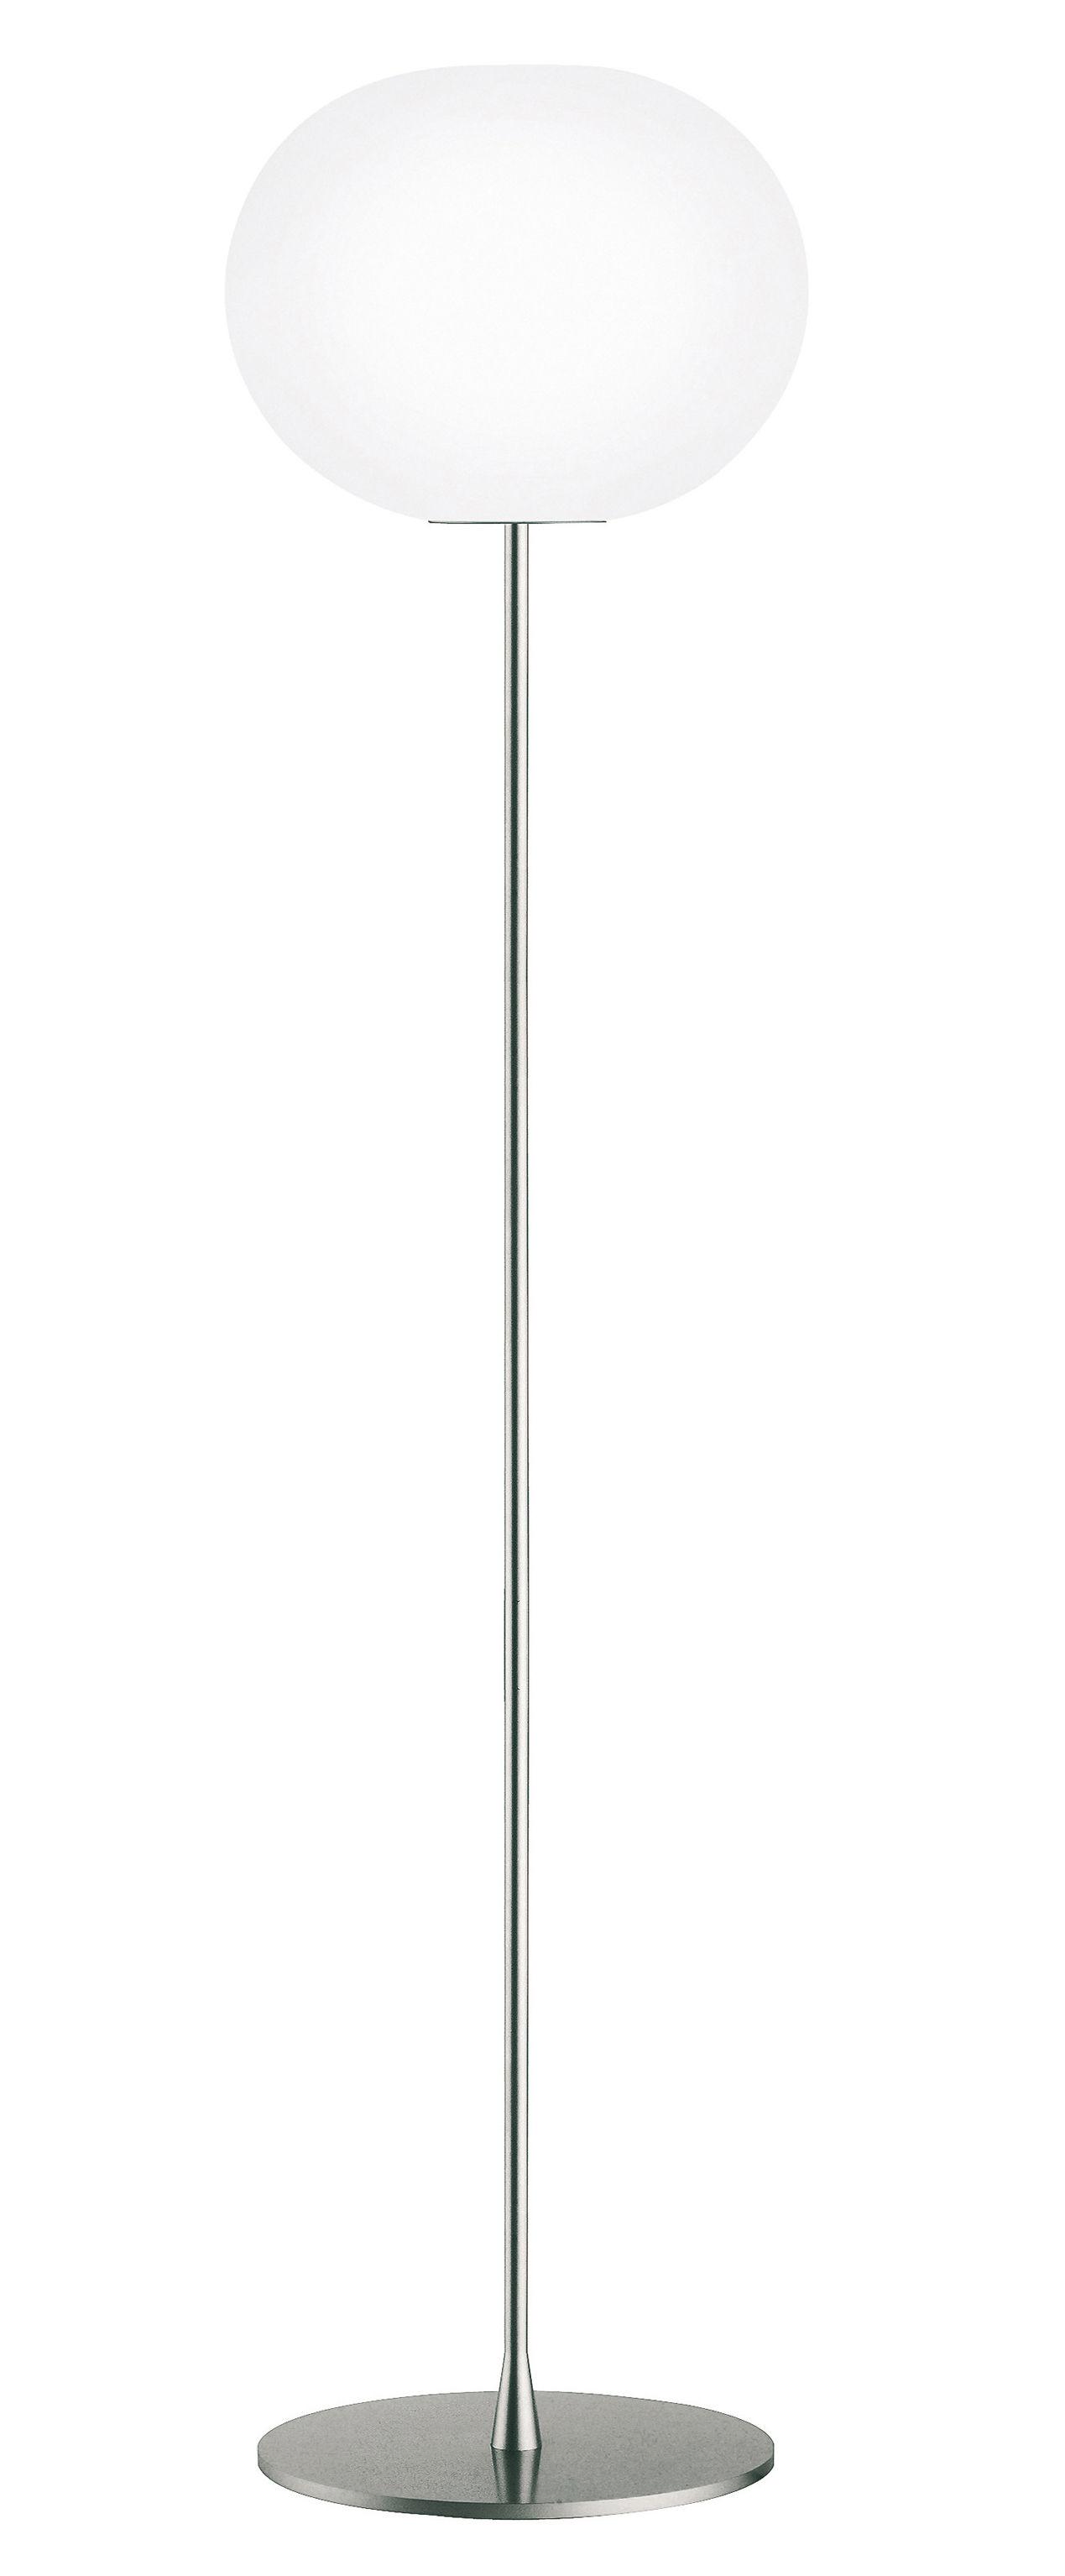 Lighting - Floor lamps - Glo-Ball F3 Floor lamp by Flos - Metallic Silver - Glass